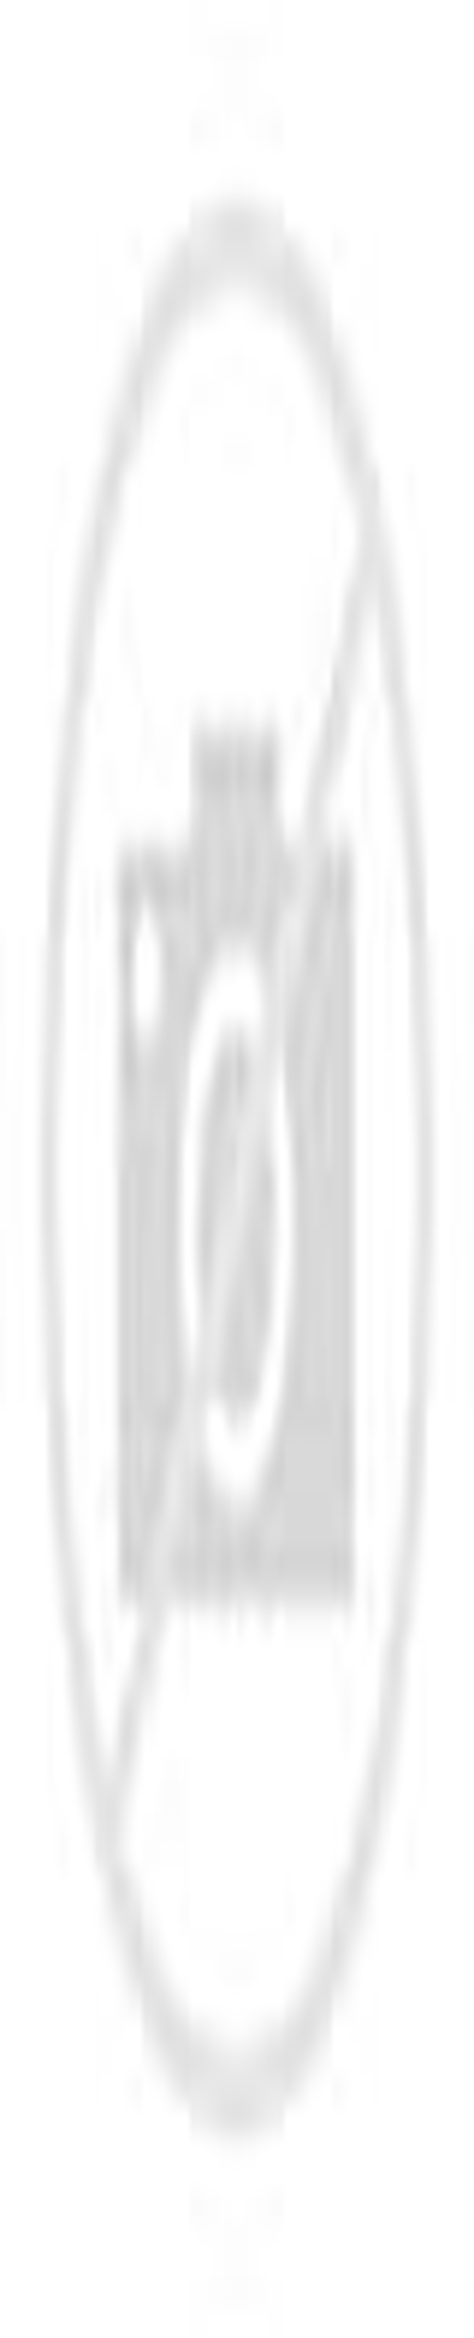 anti sex kahani hindi to hindi me, picture 11